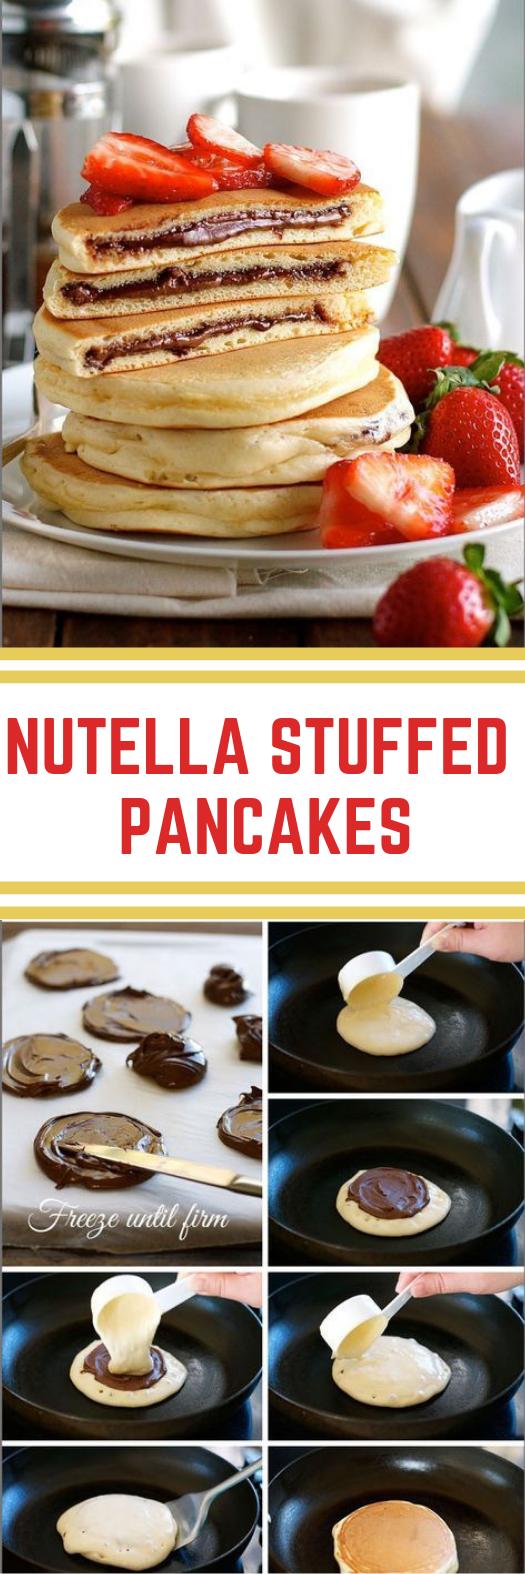 Nutella Stuffed Pancakes #pancake #dessert